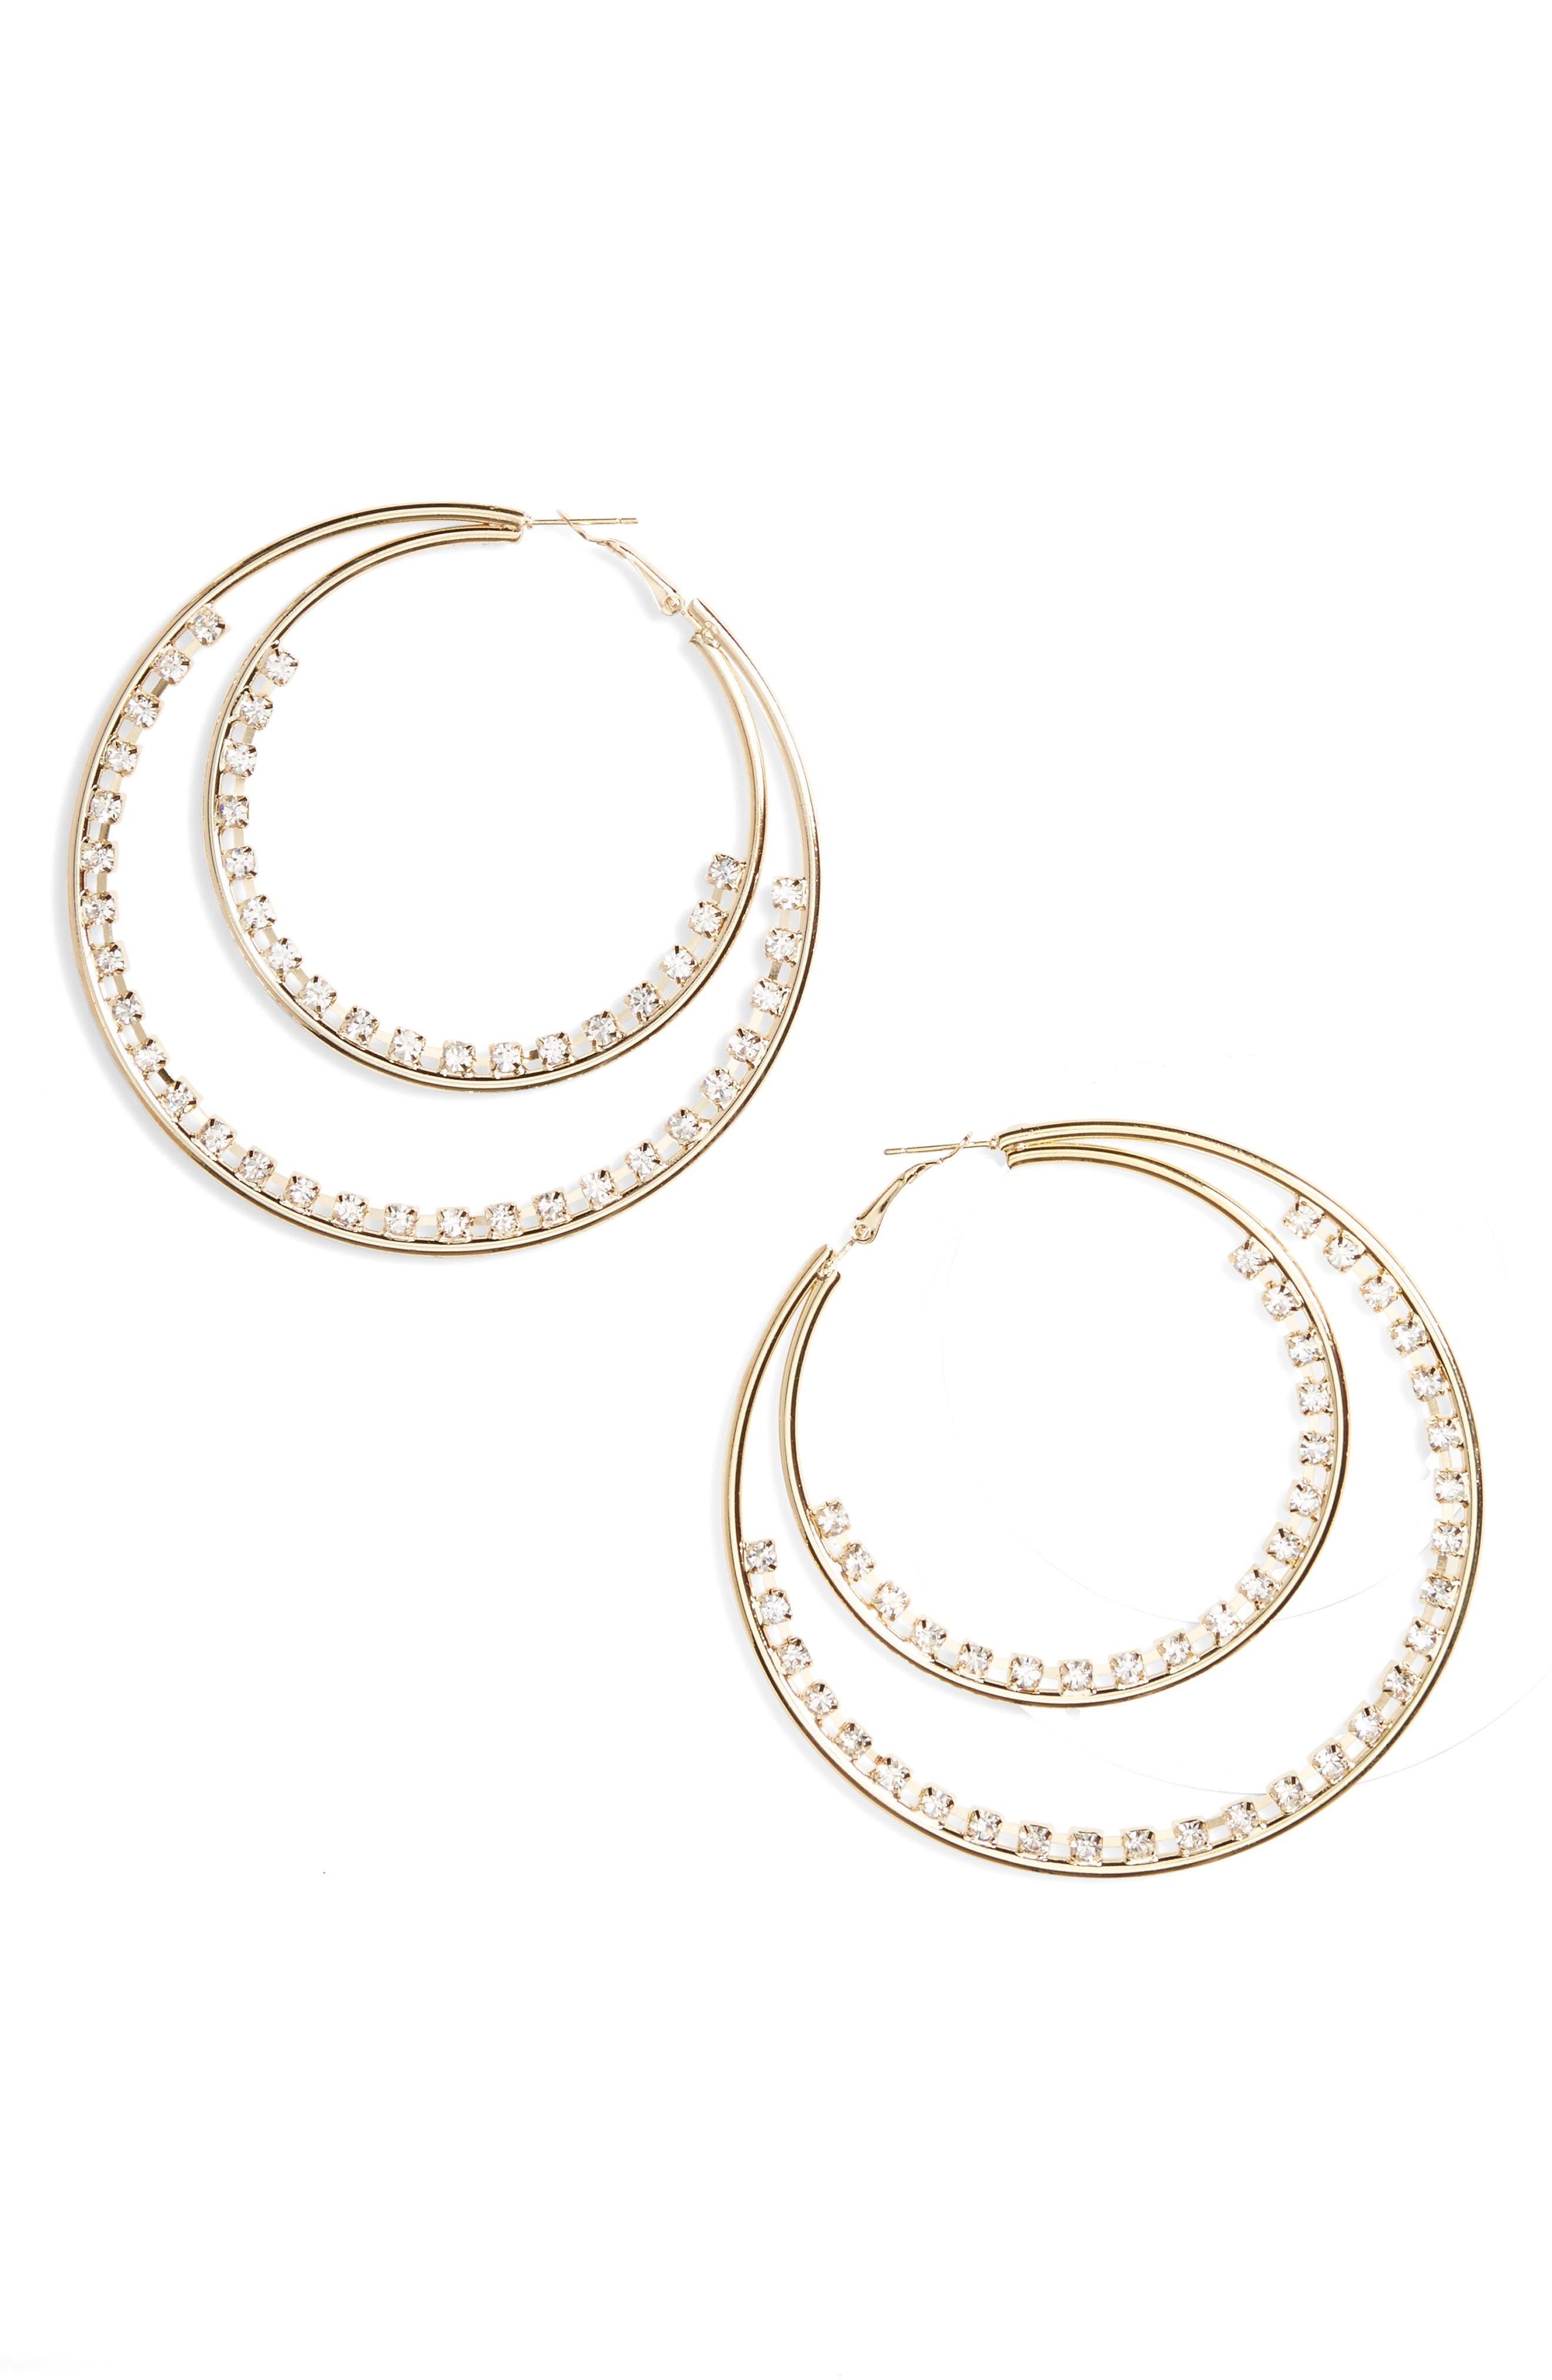 Main Image - Natasha Row Crystal Double Hoop Earrings